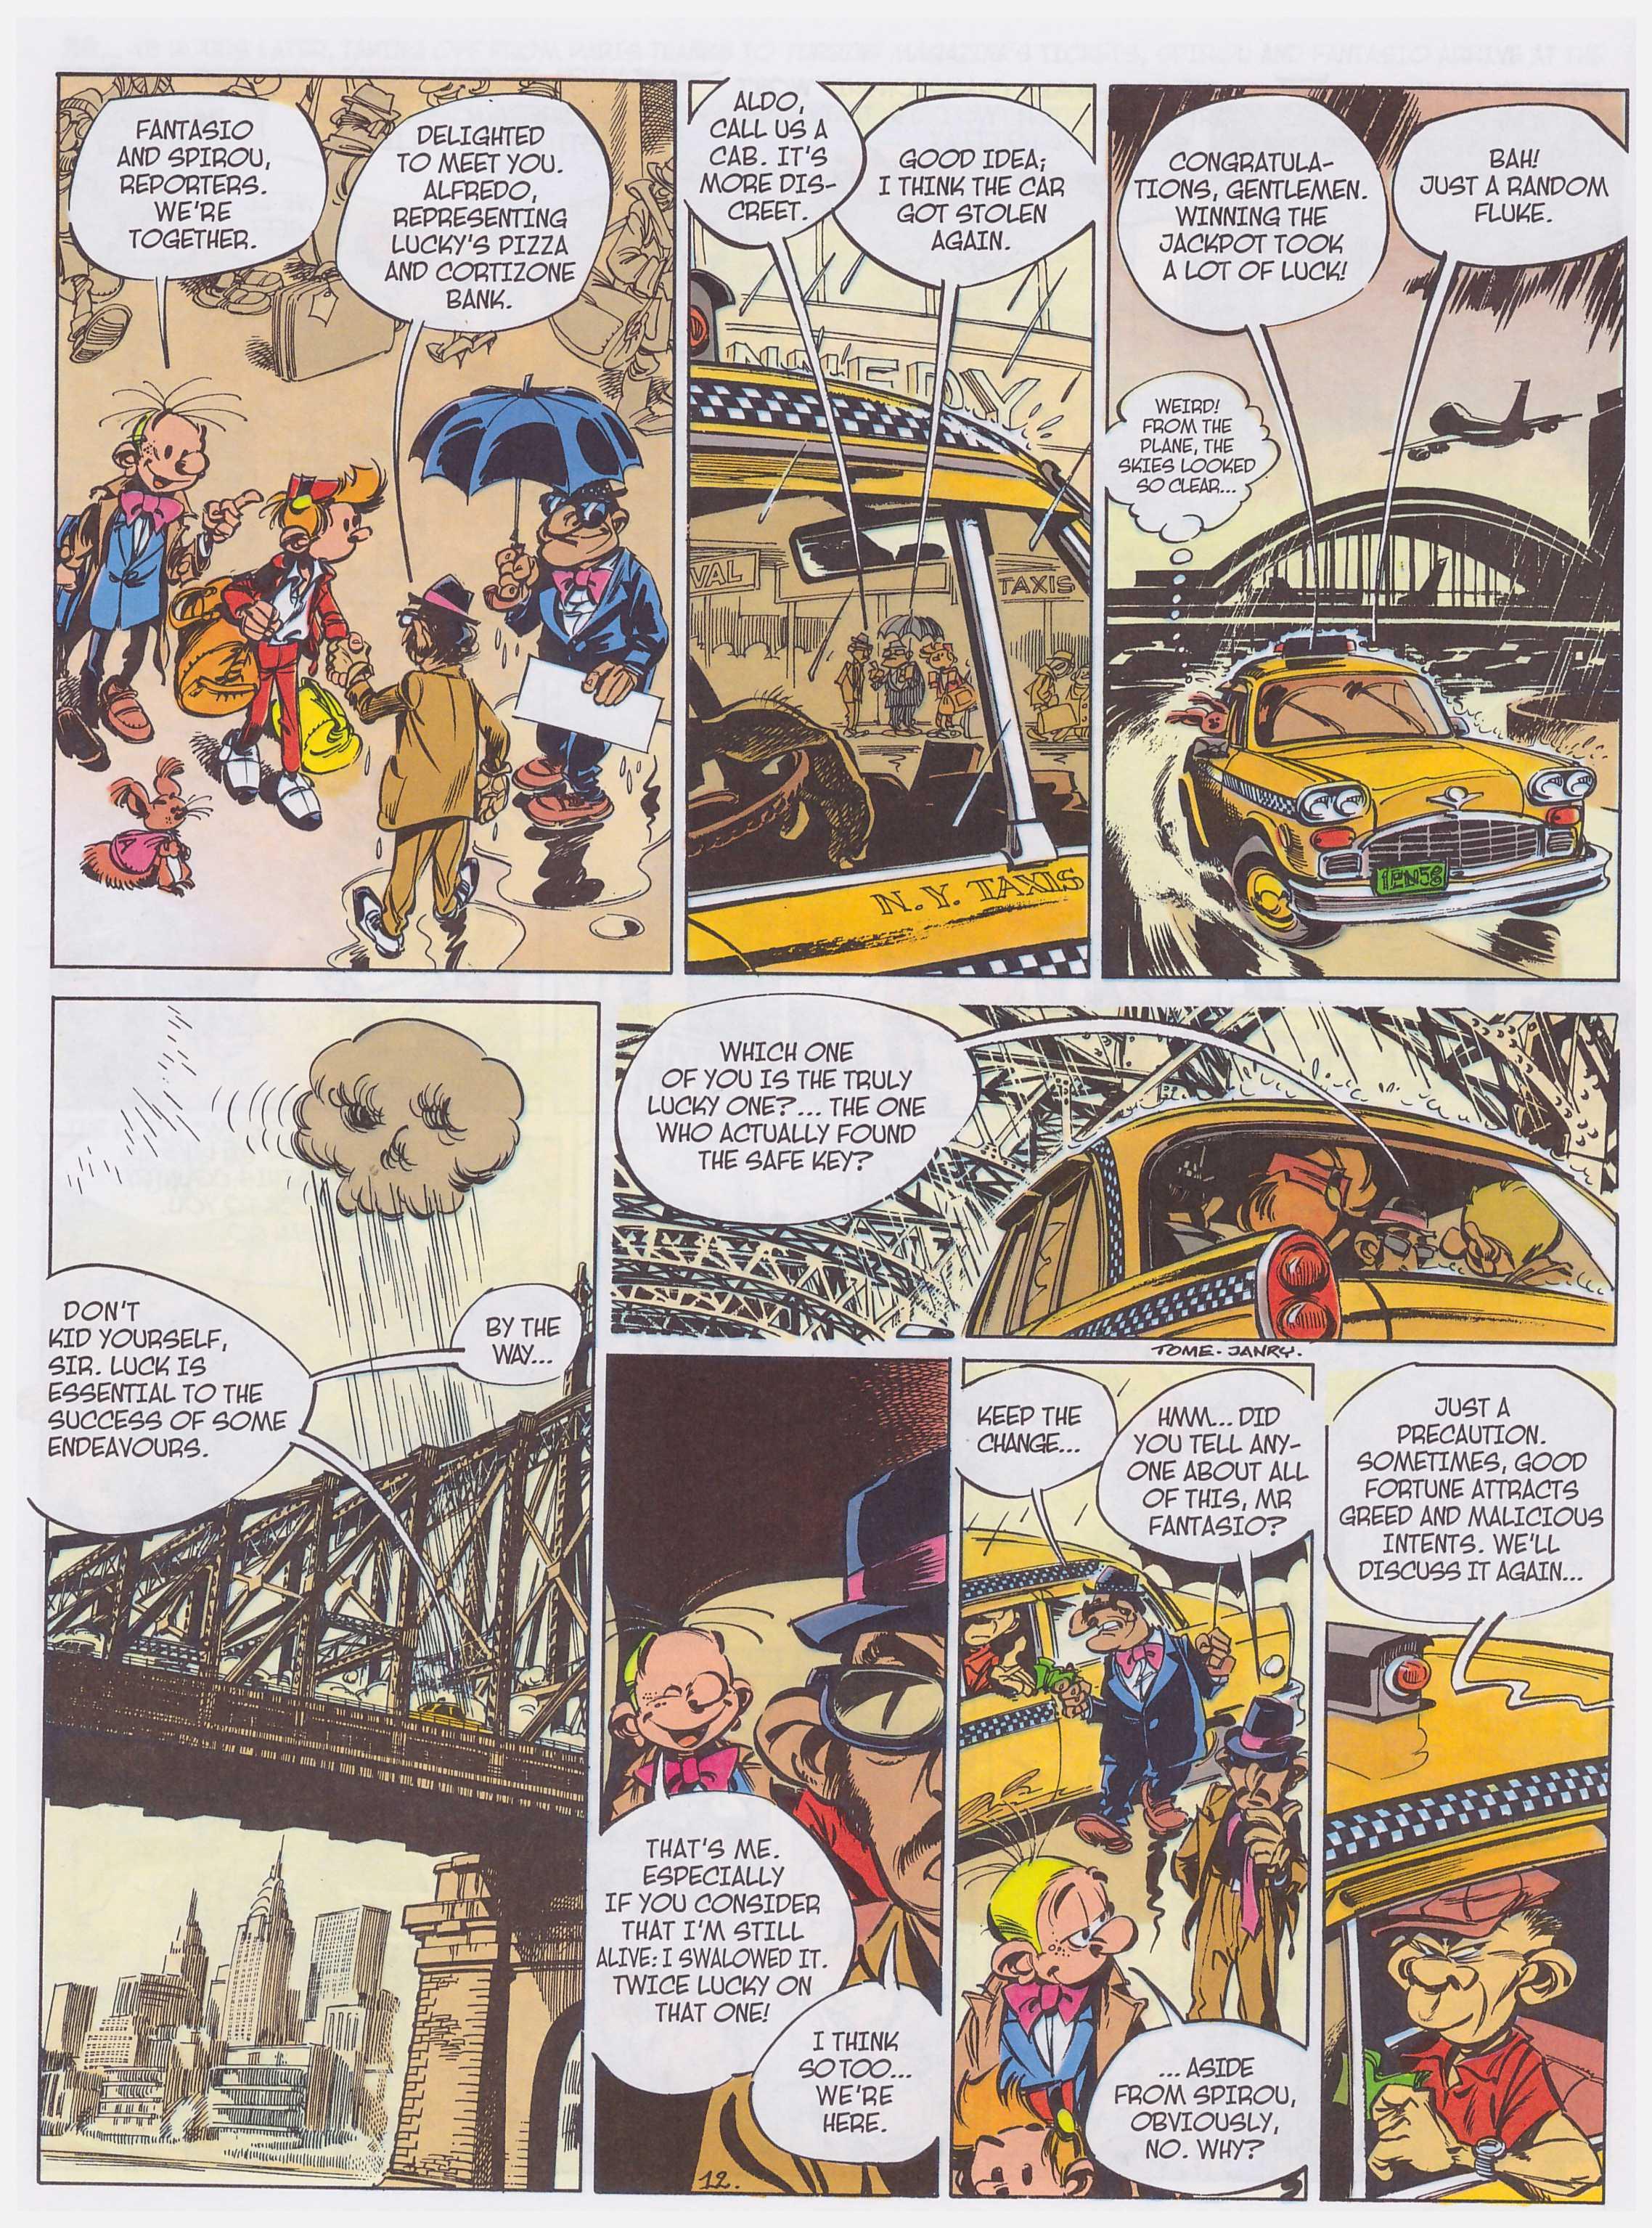 Spirou & Fantasio in New York review